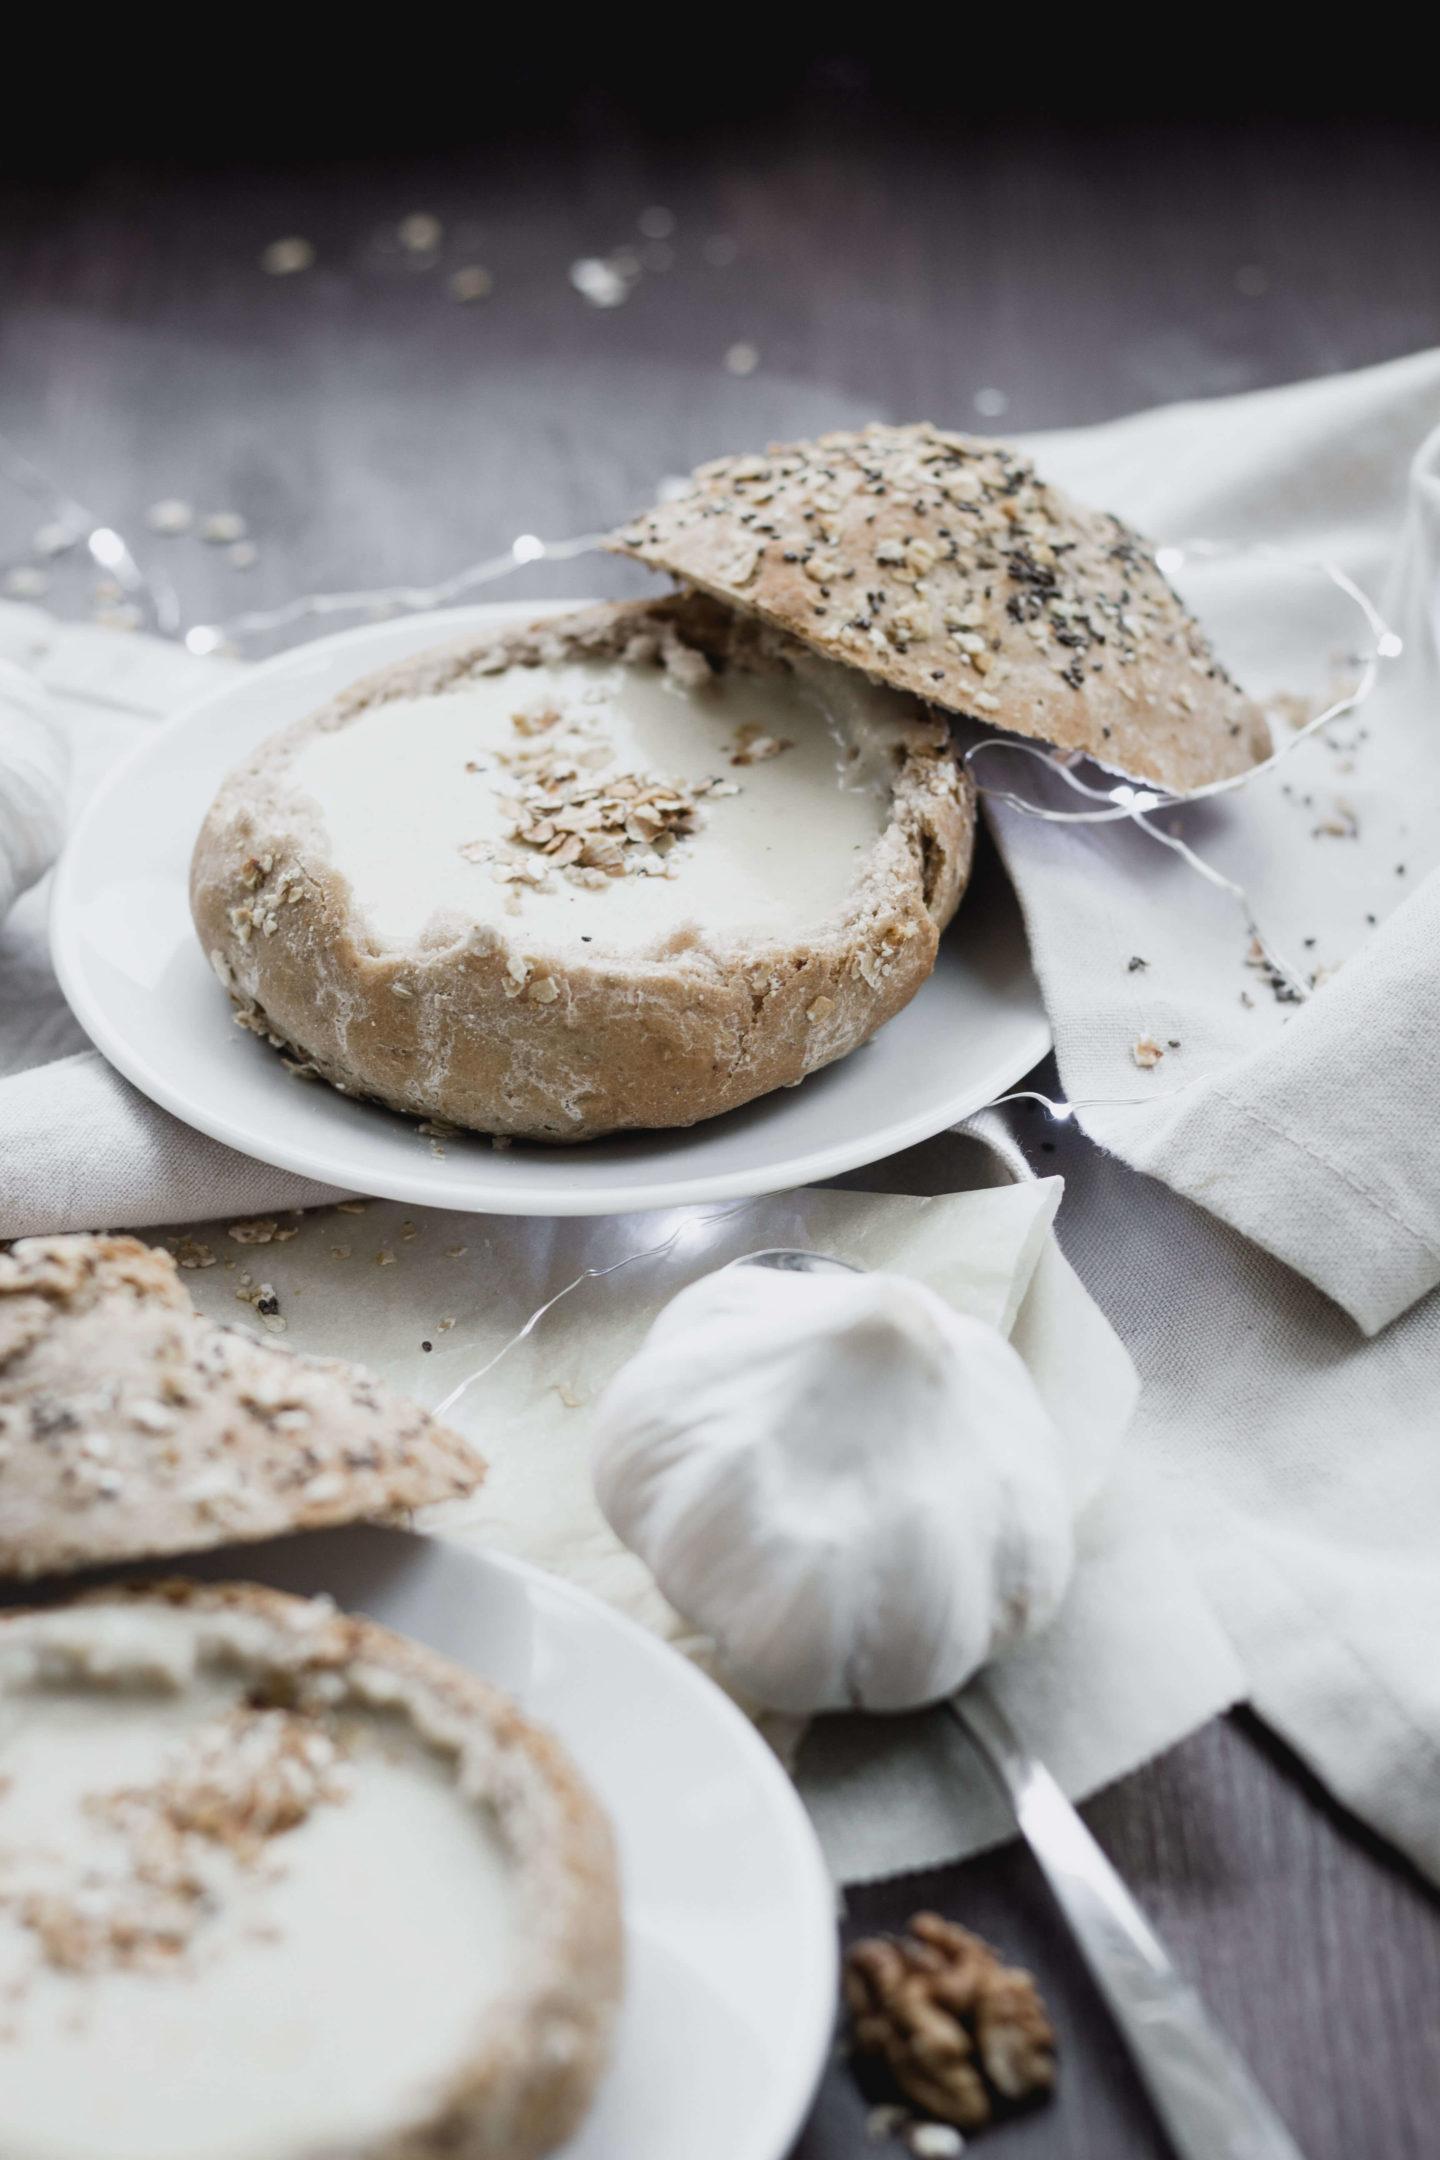 Vegane Knoblauchcremesuppe im Brotteig!